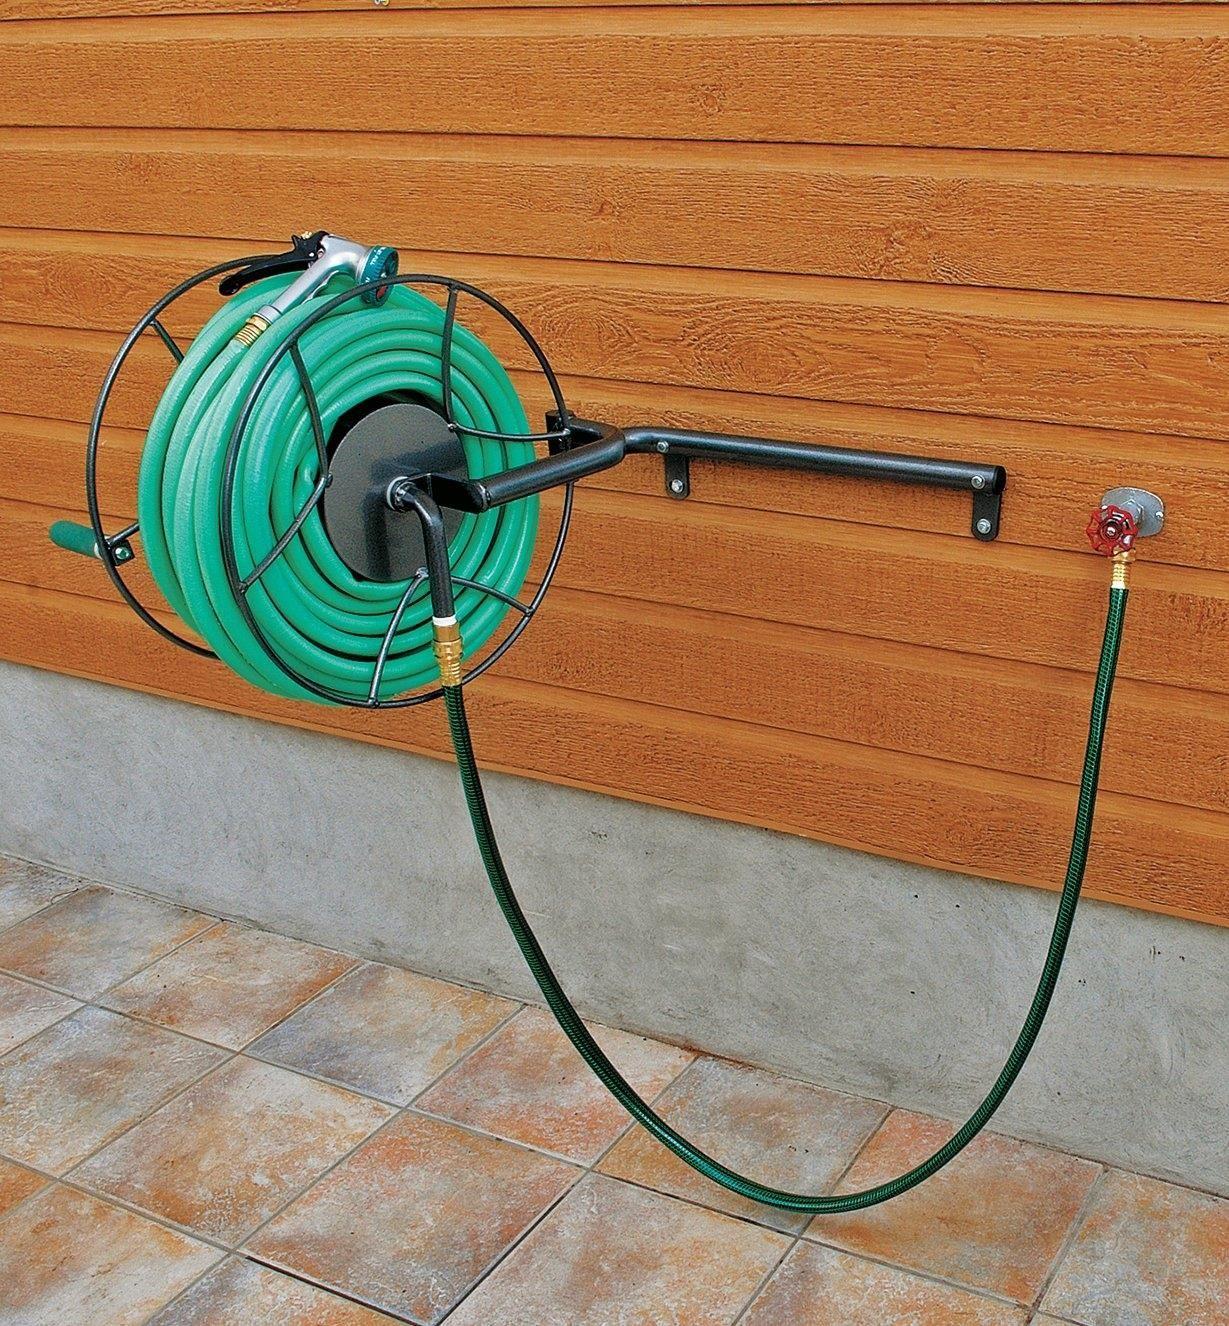 WallMount Swivel Hose Reel (With images) Hose reel